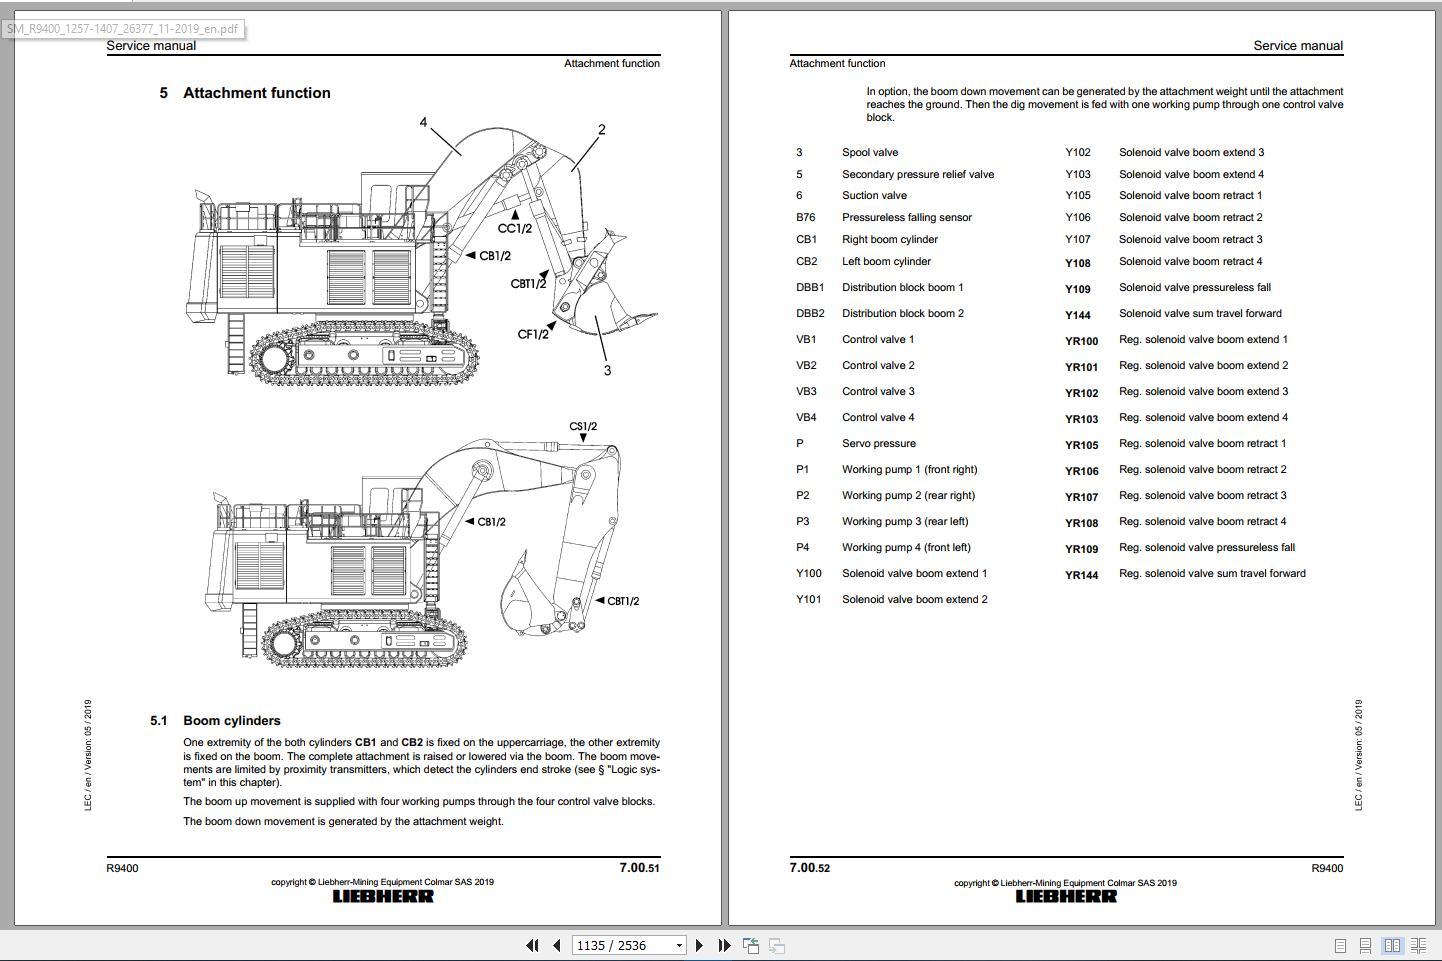 Liebherr_Mining_Excavators_Service_Manual_New_Updated_032020_29